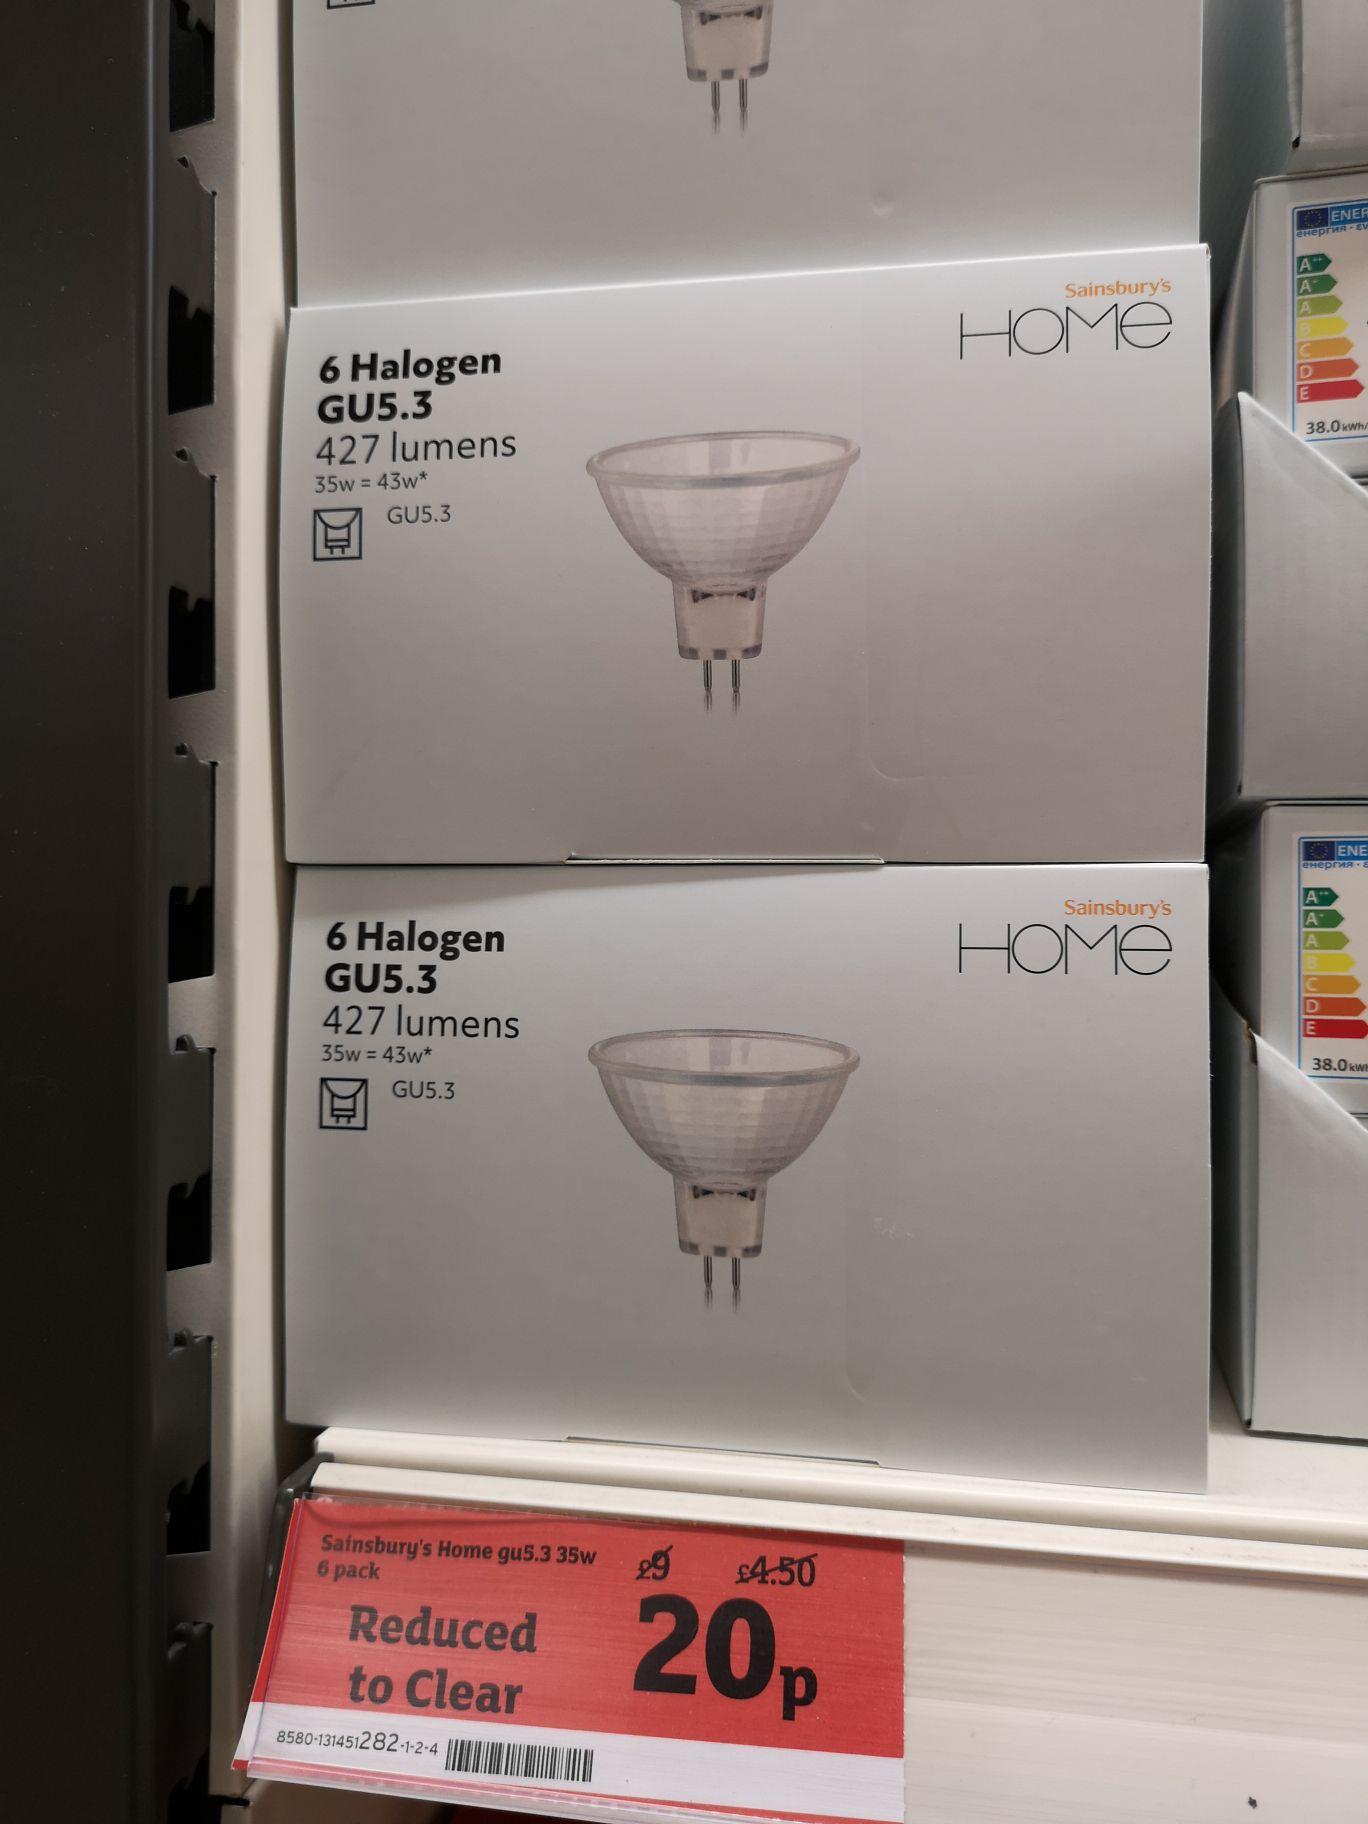 Pack of six GU 5.3 halogen down lighter bulbs. 20p in store Sainsbury's Farlington, Portsmouth